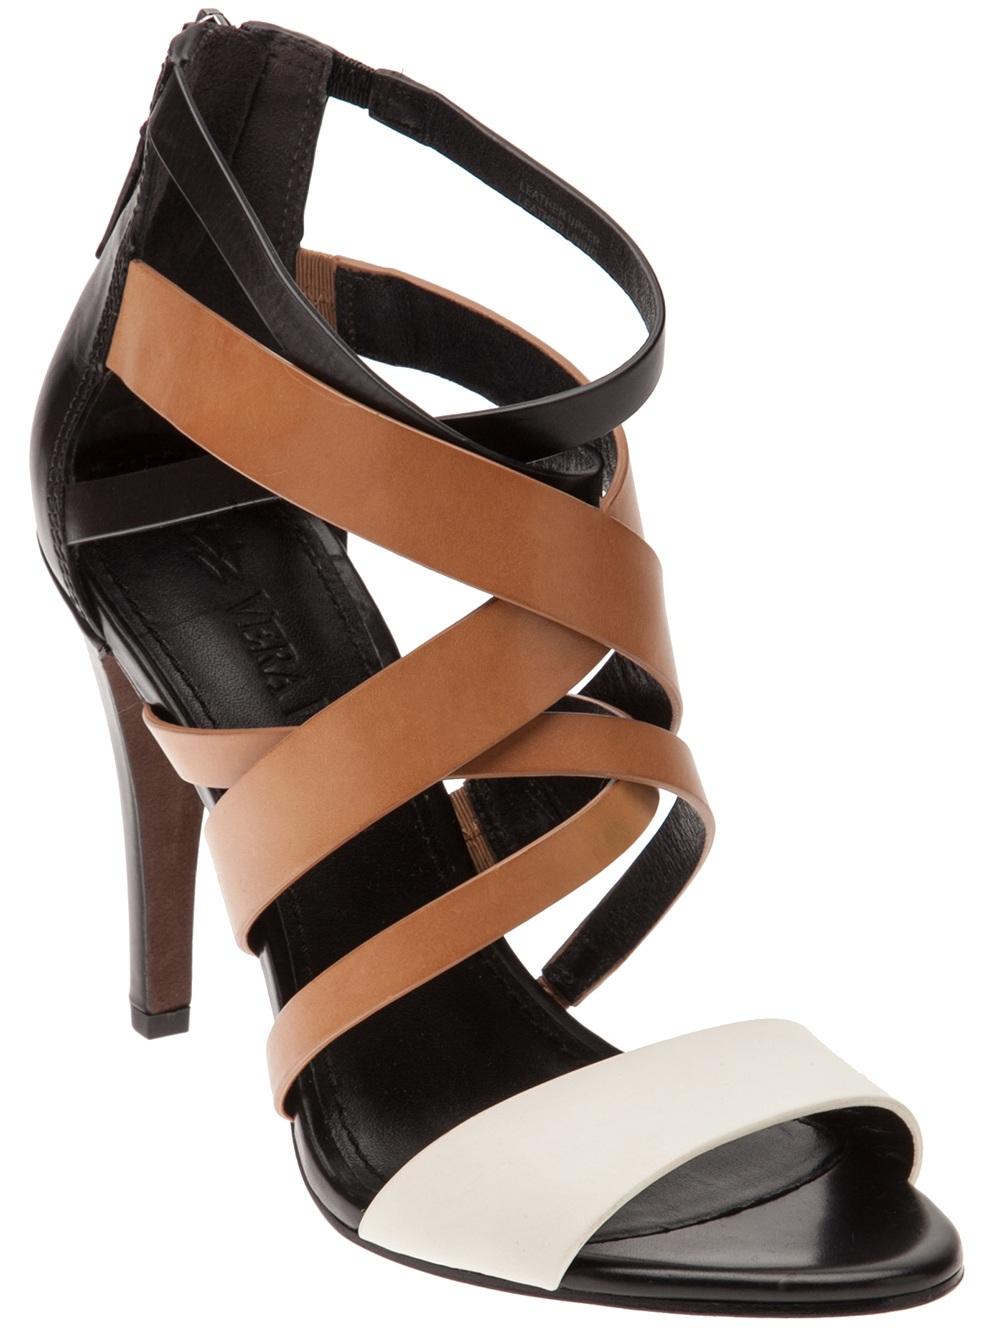 Vera wang Strappy High Heel Sandal in Brown | Lyst